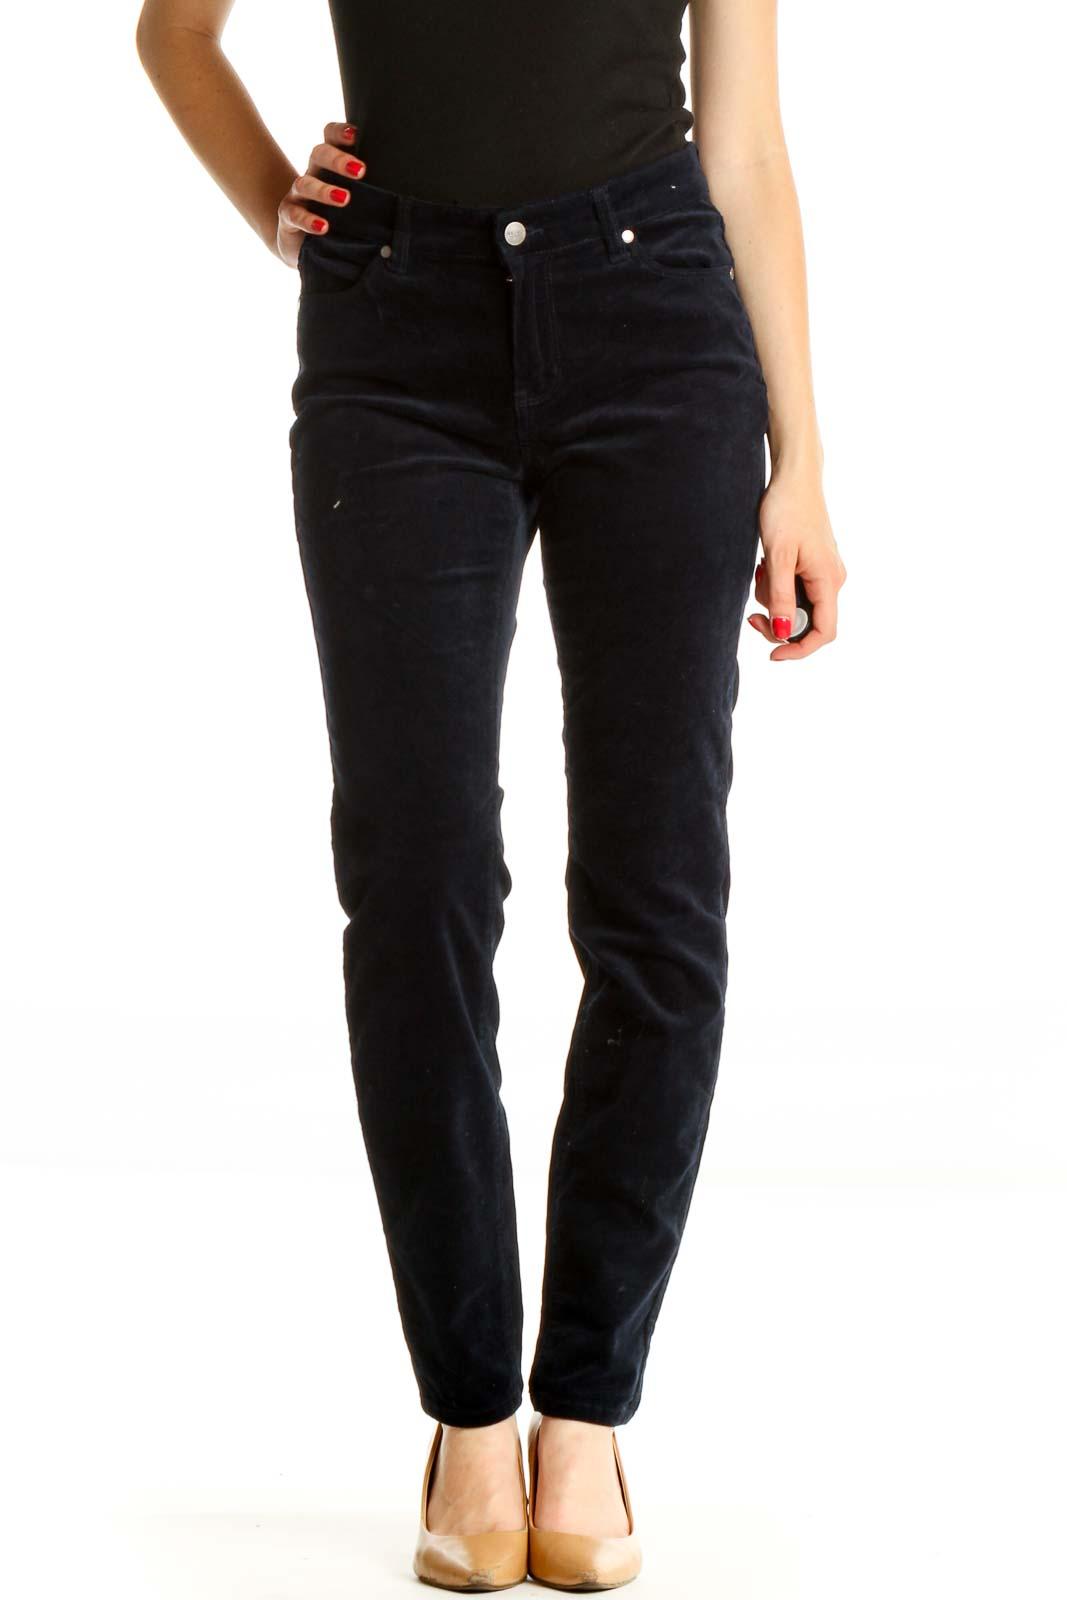 Blue Velour Skinny Jeans Front